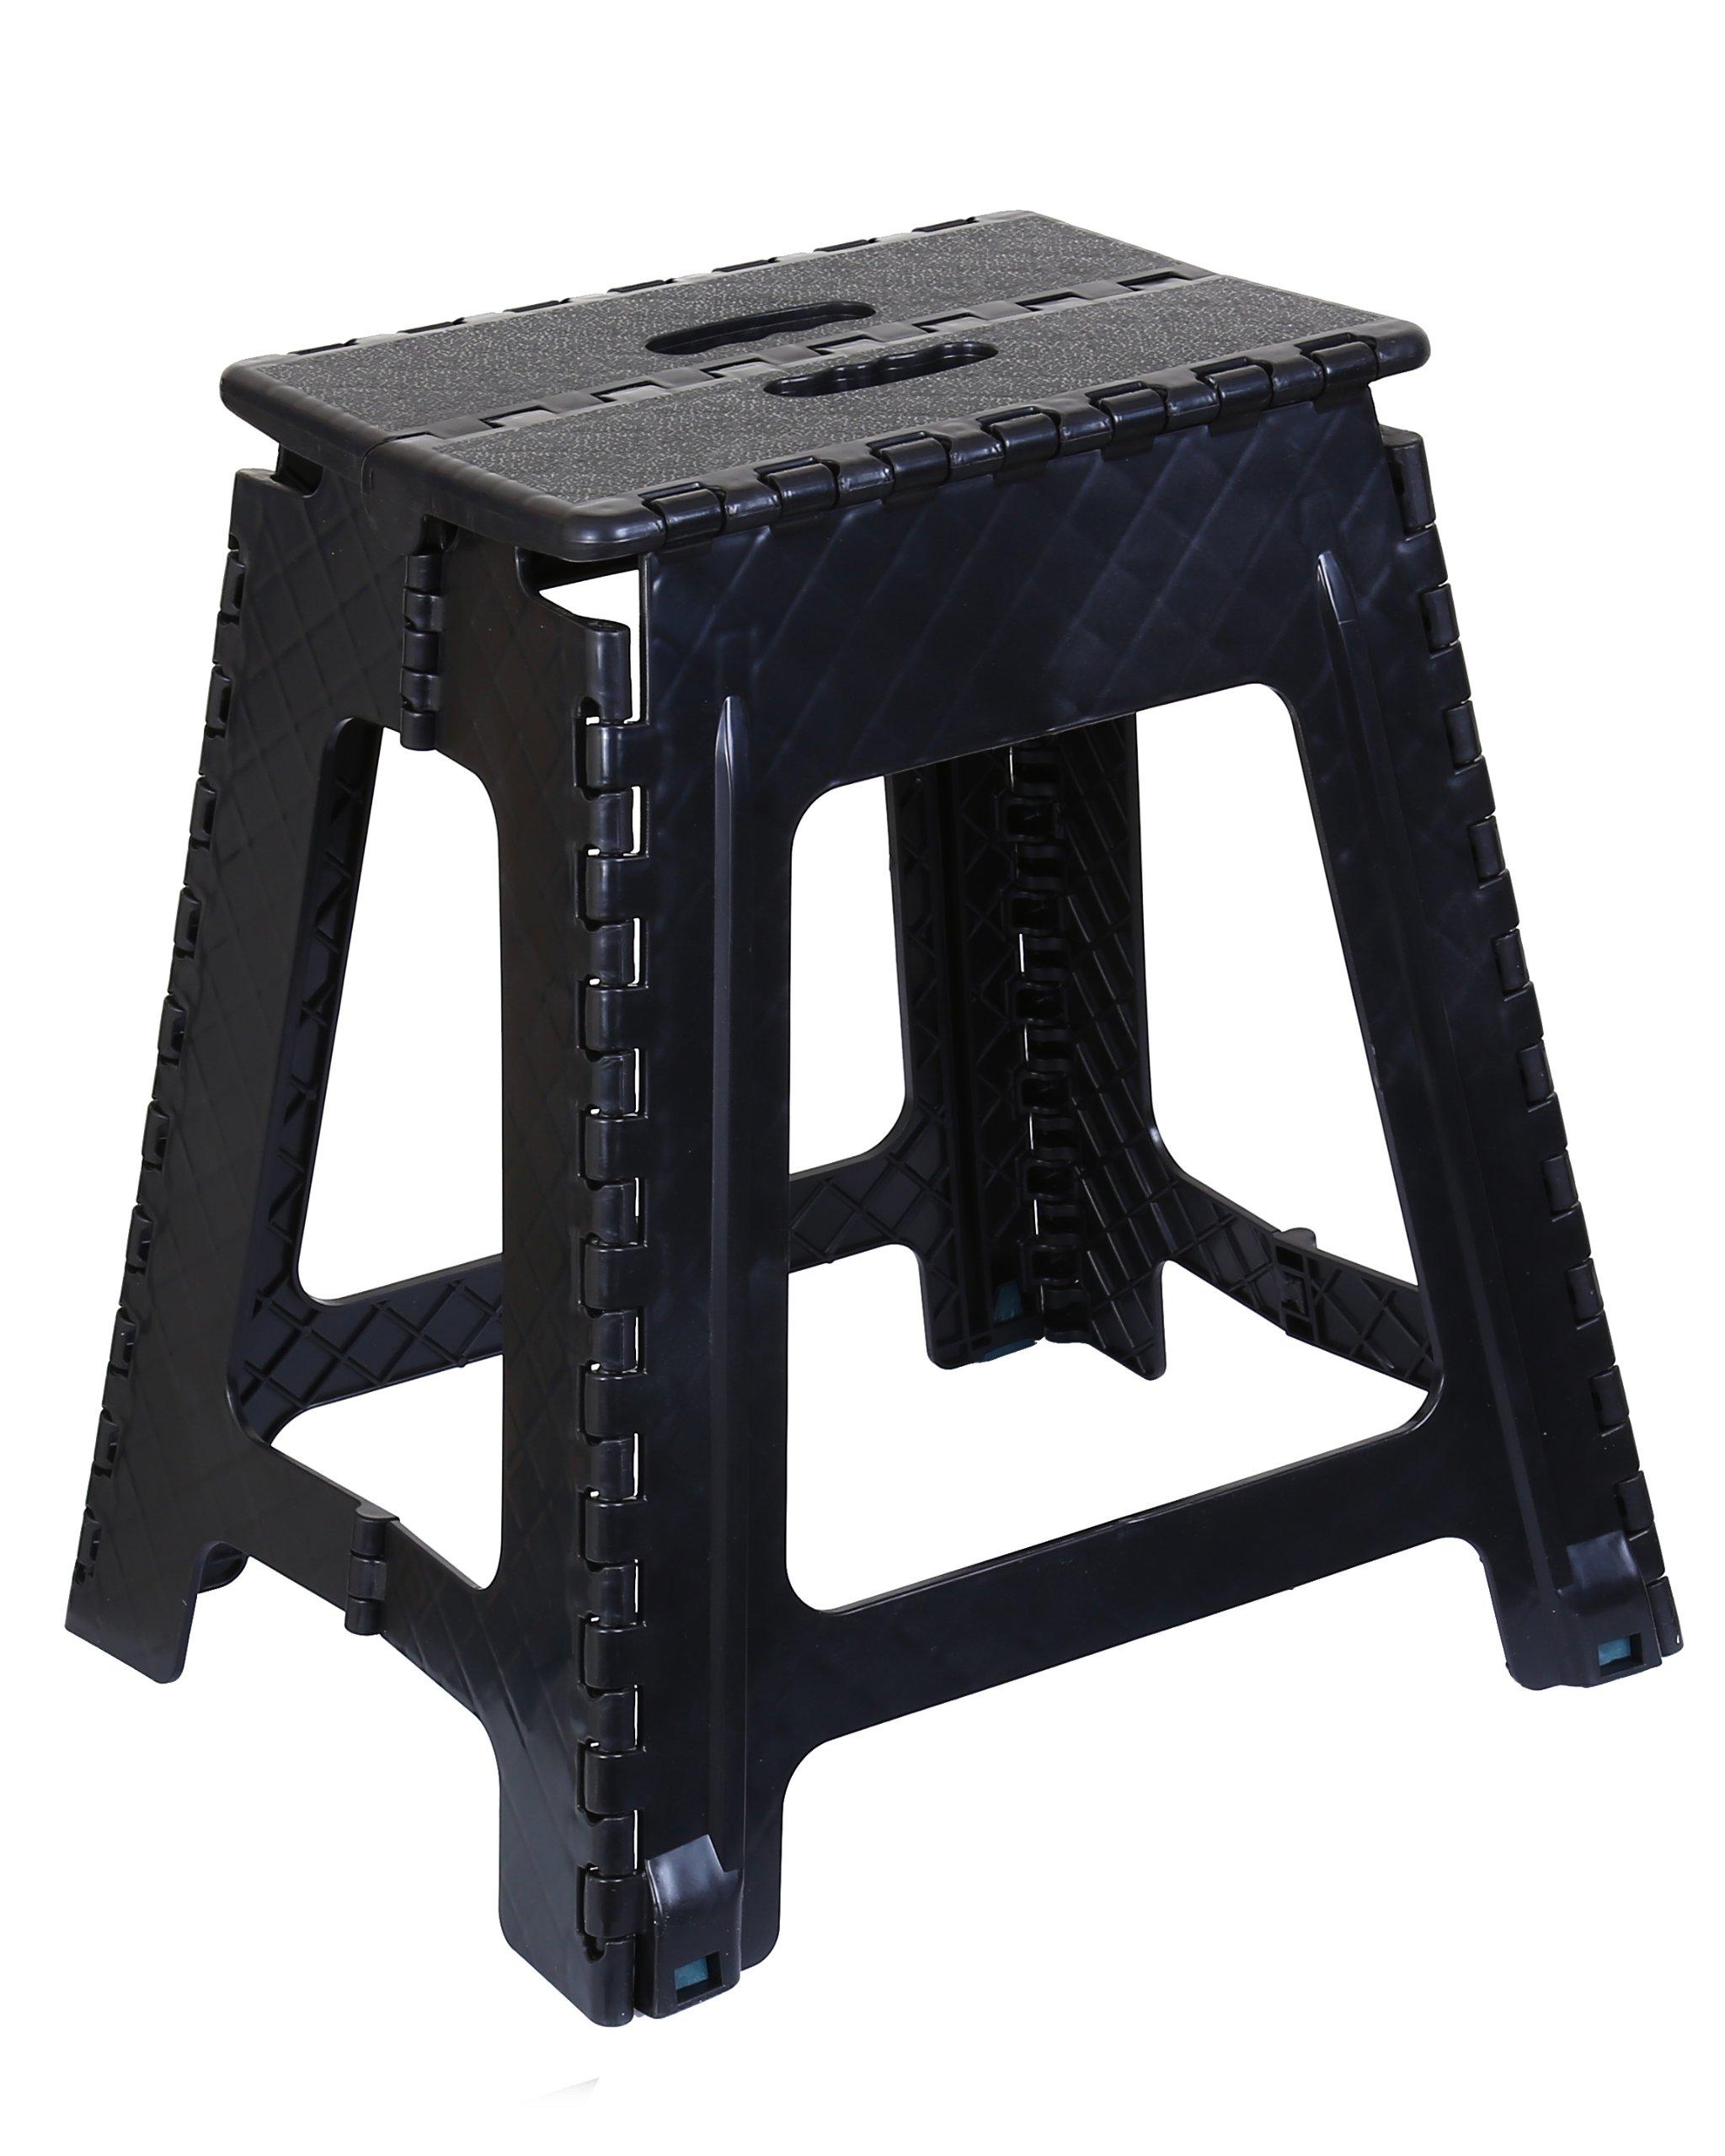 Superior Performance Folding Step Stool 18 Inch (Grey) (Black)